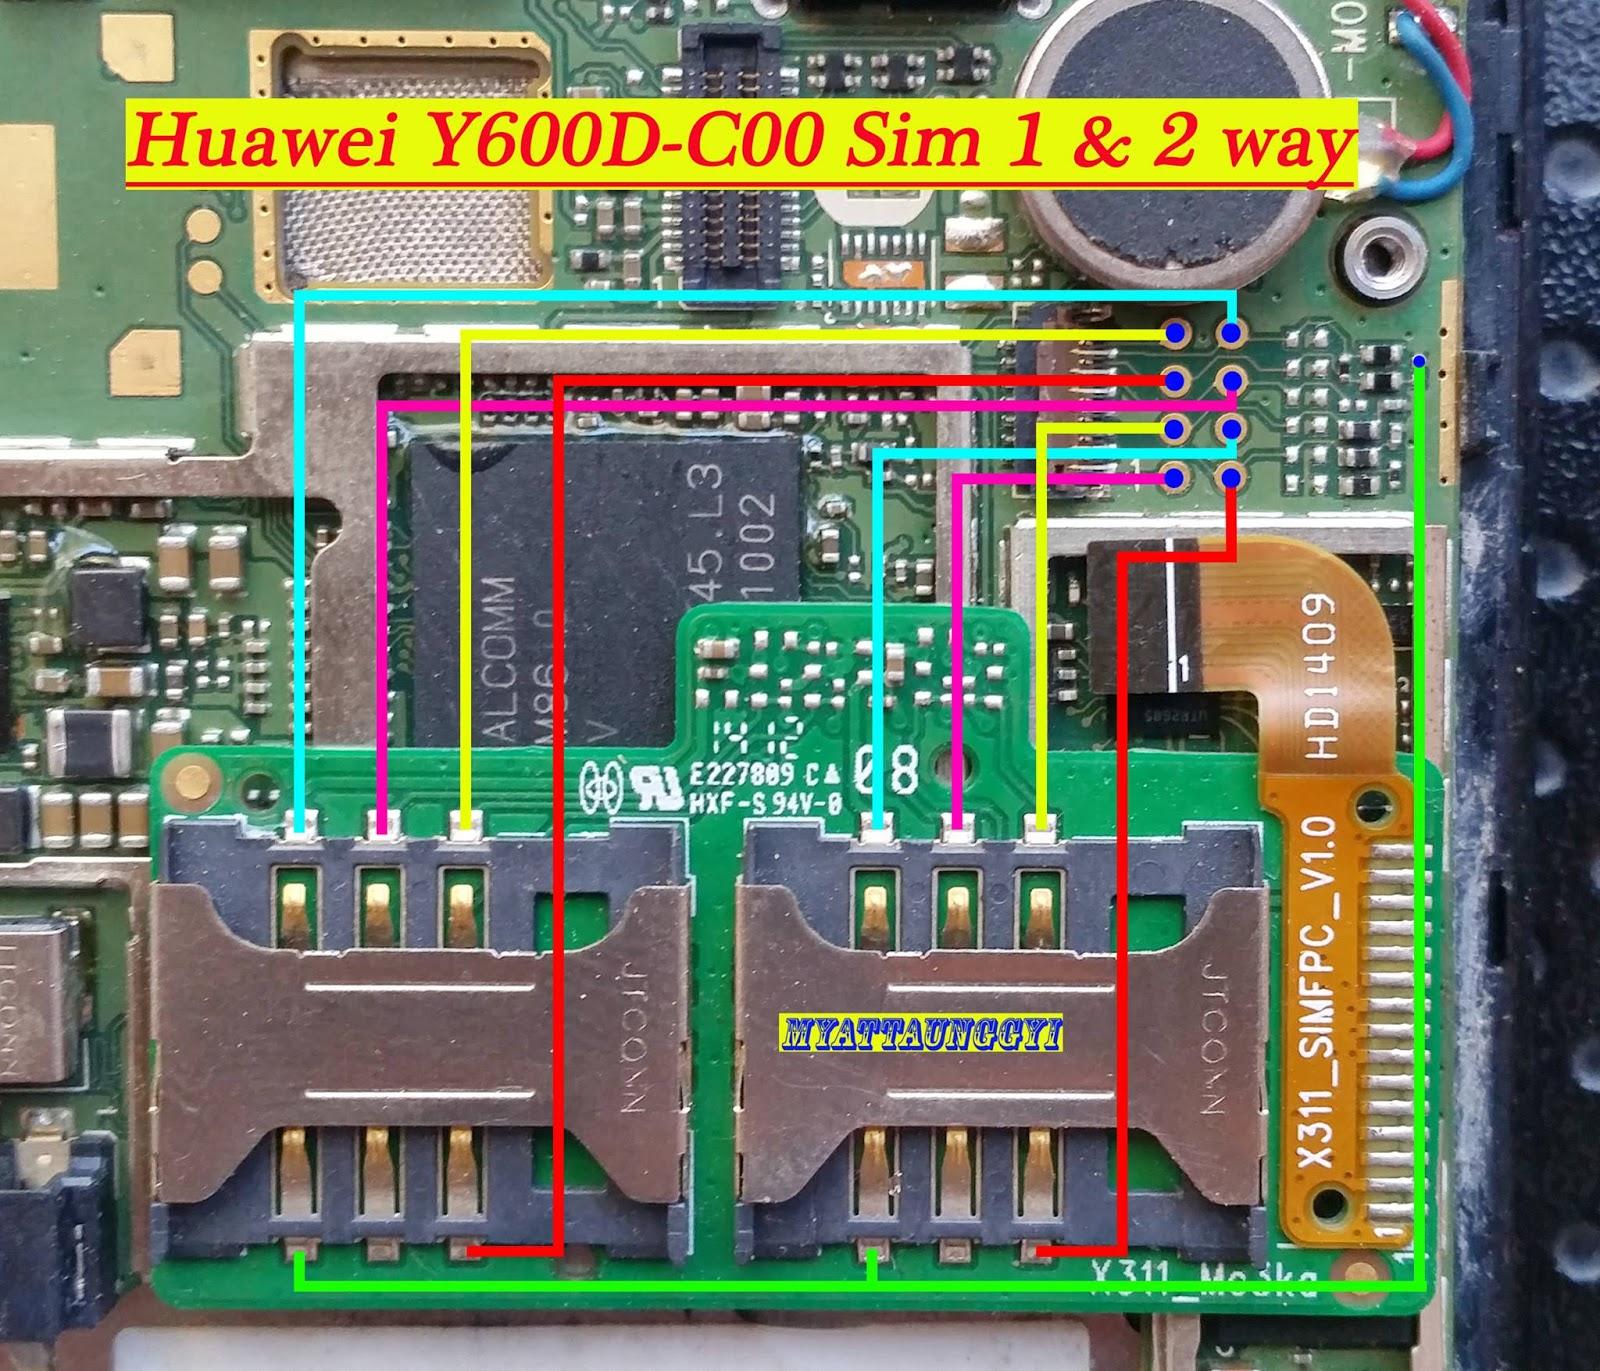 Huawei G6C00 Jumper way